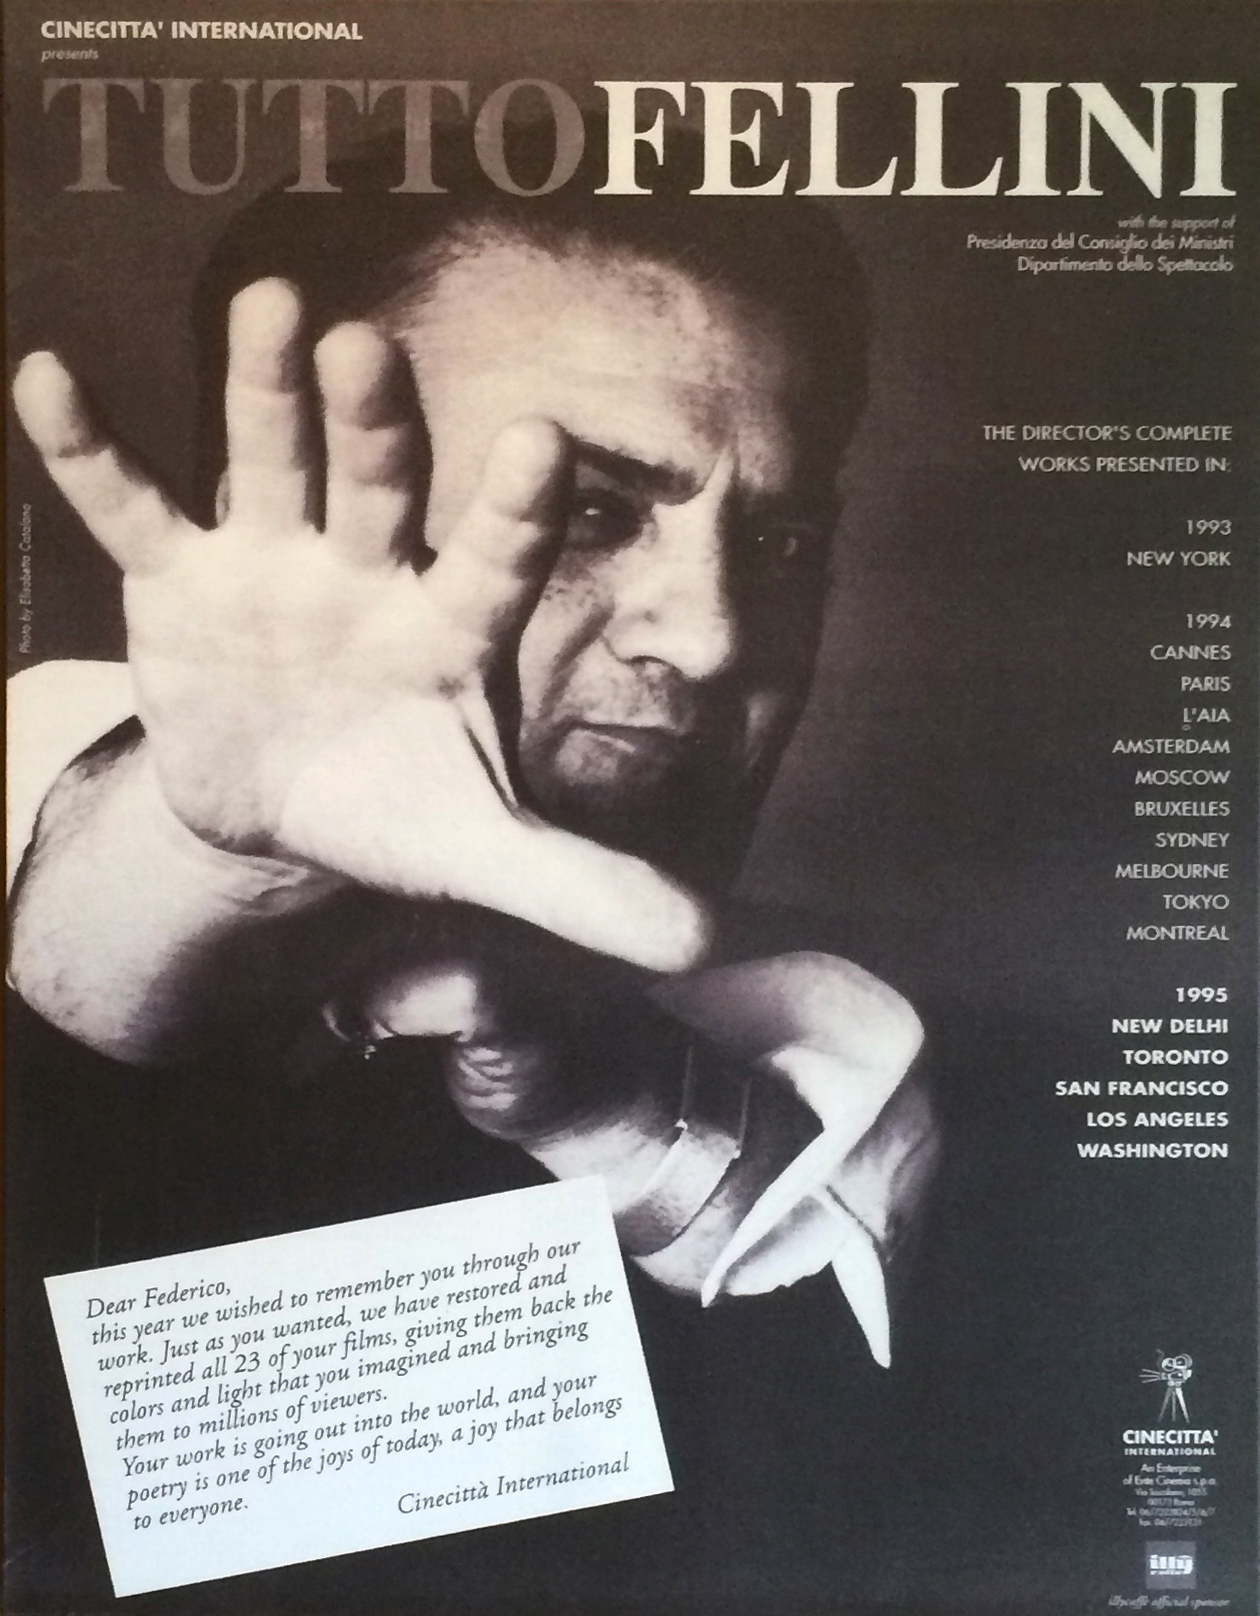 Fellini_Cinecita International_Poster